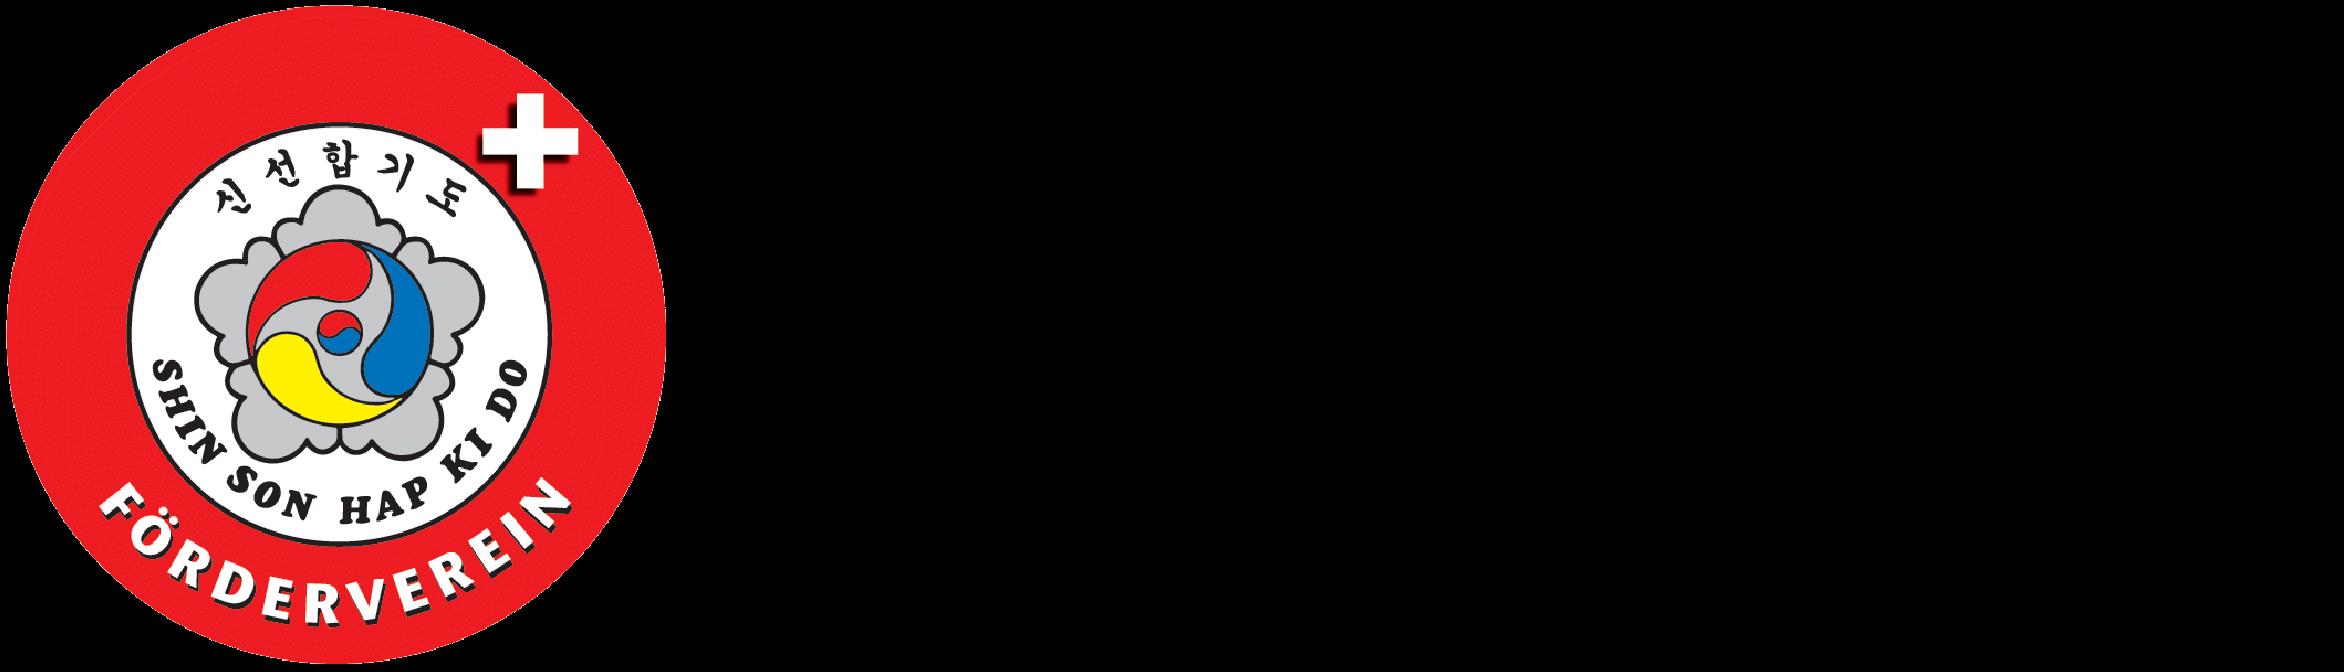 Shinson Hapkido Förderverein Schweiz Logo